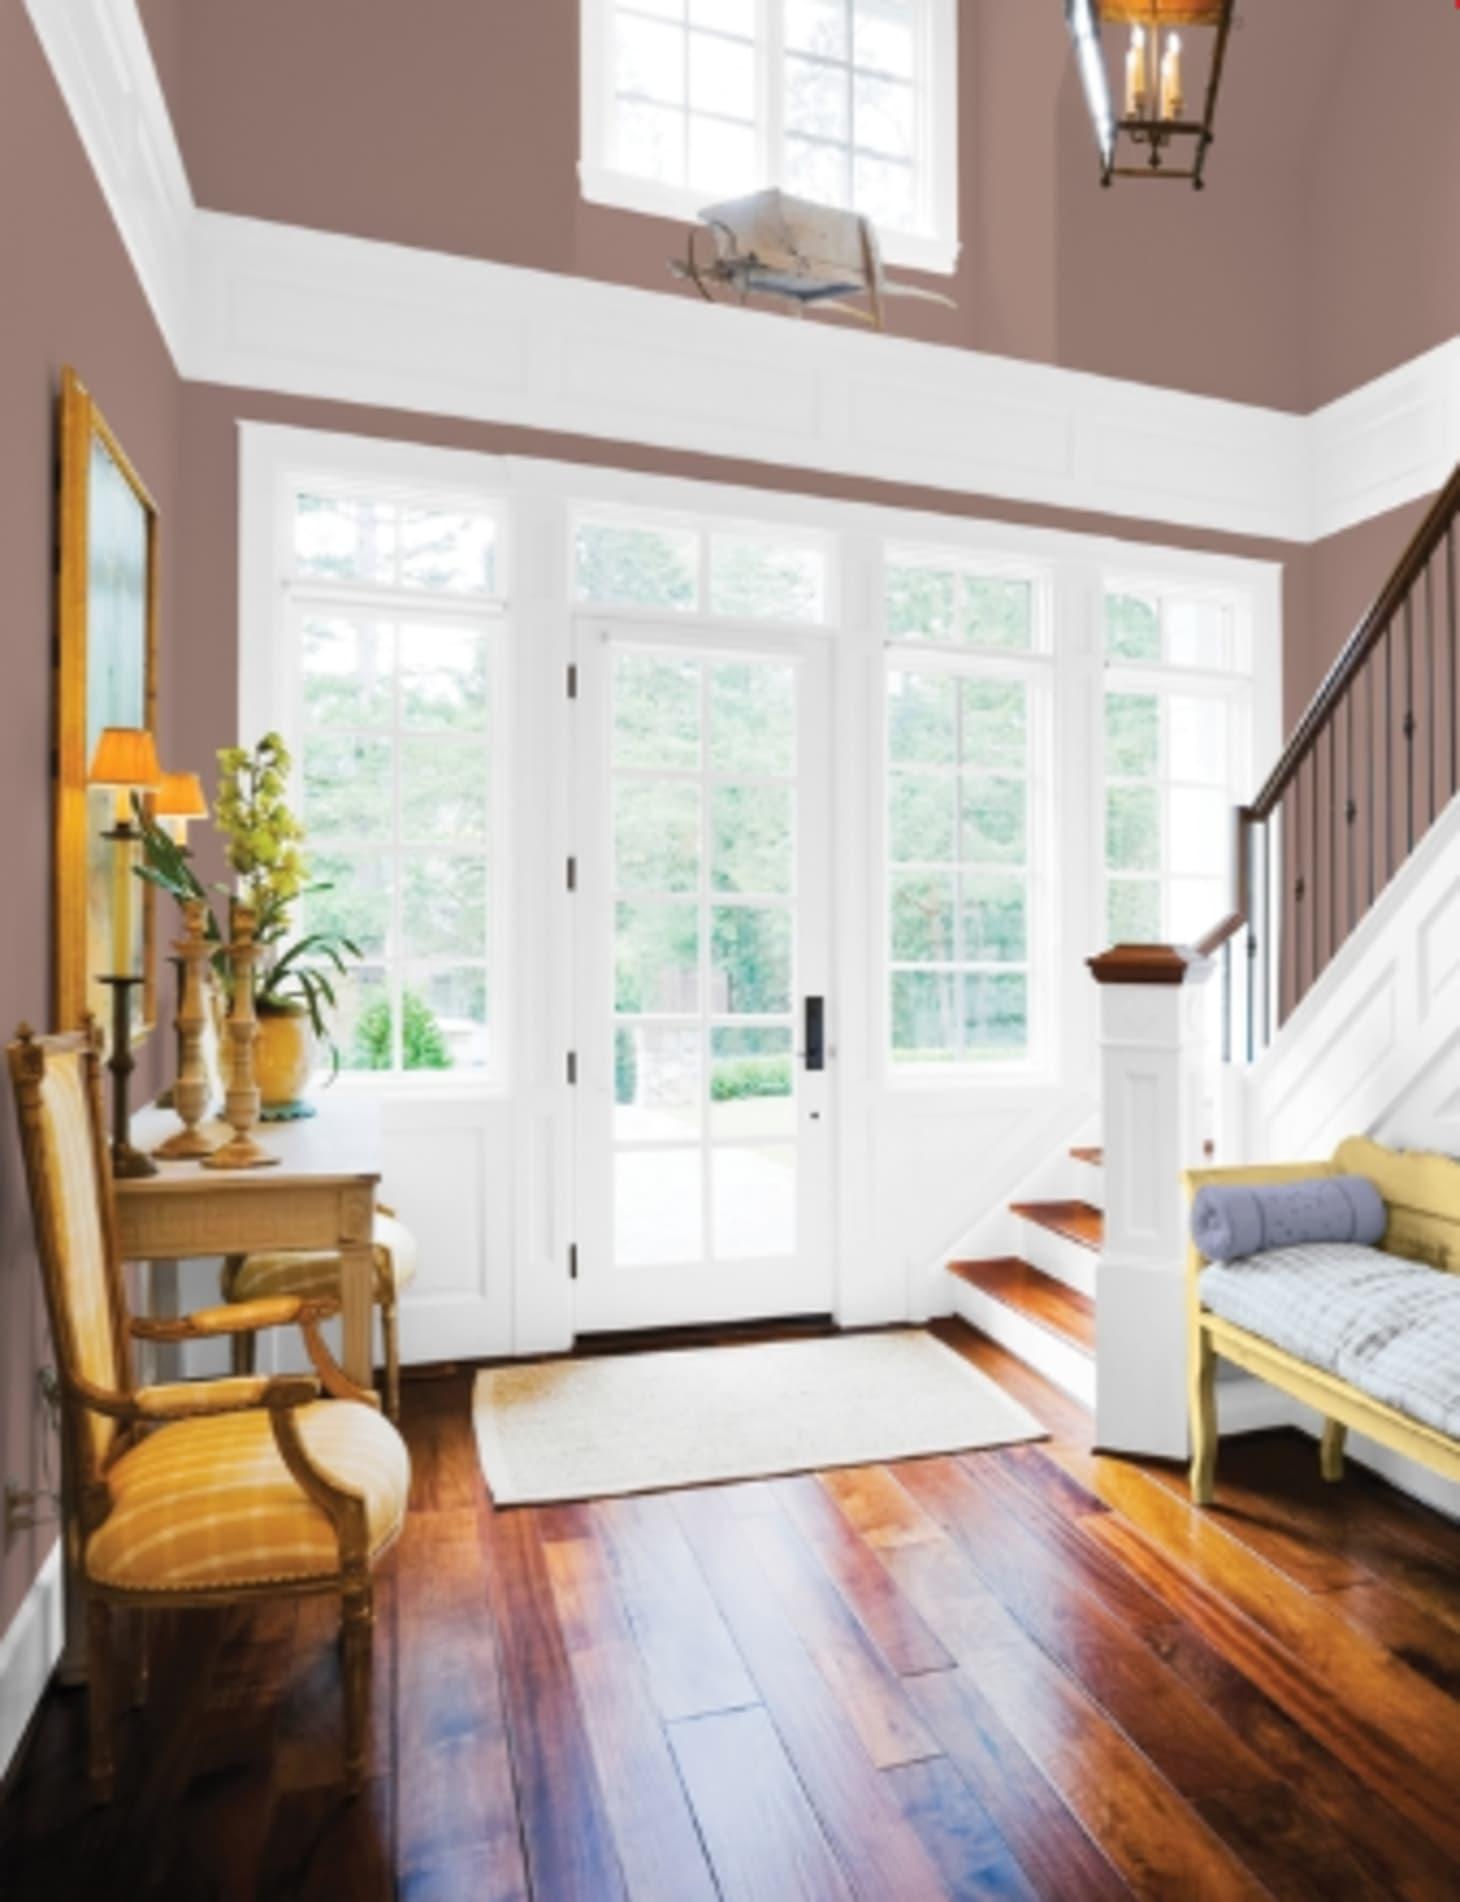 The best paint colors for modern farmhouse interiors - Farmhouse interior color schemes ...